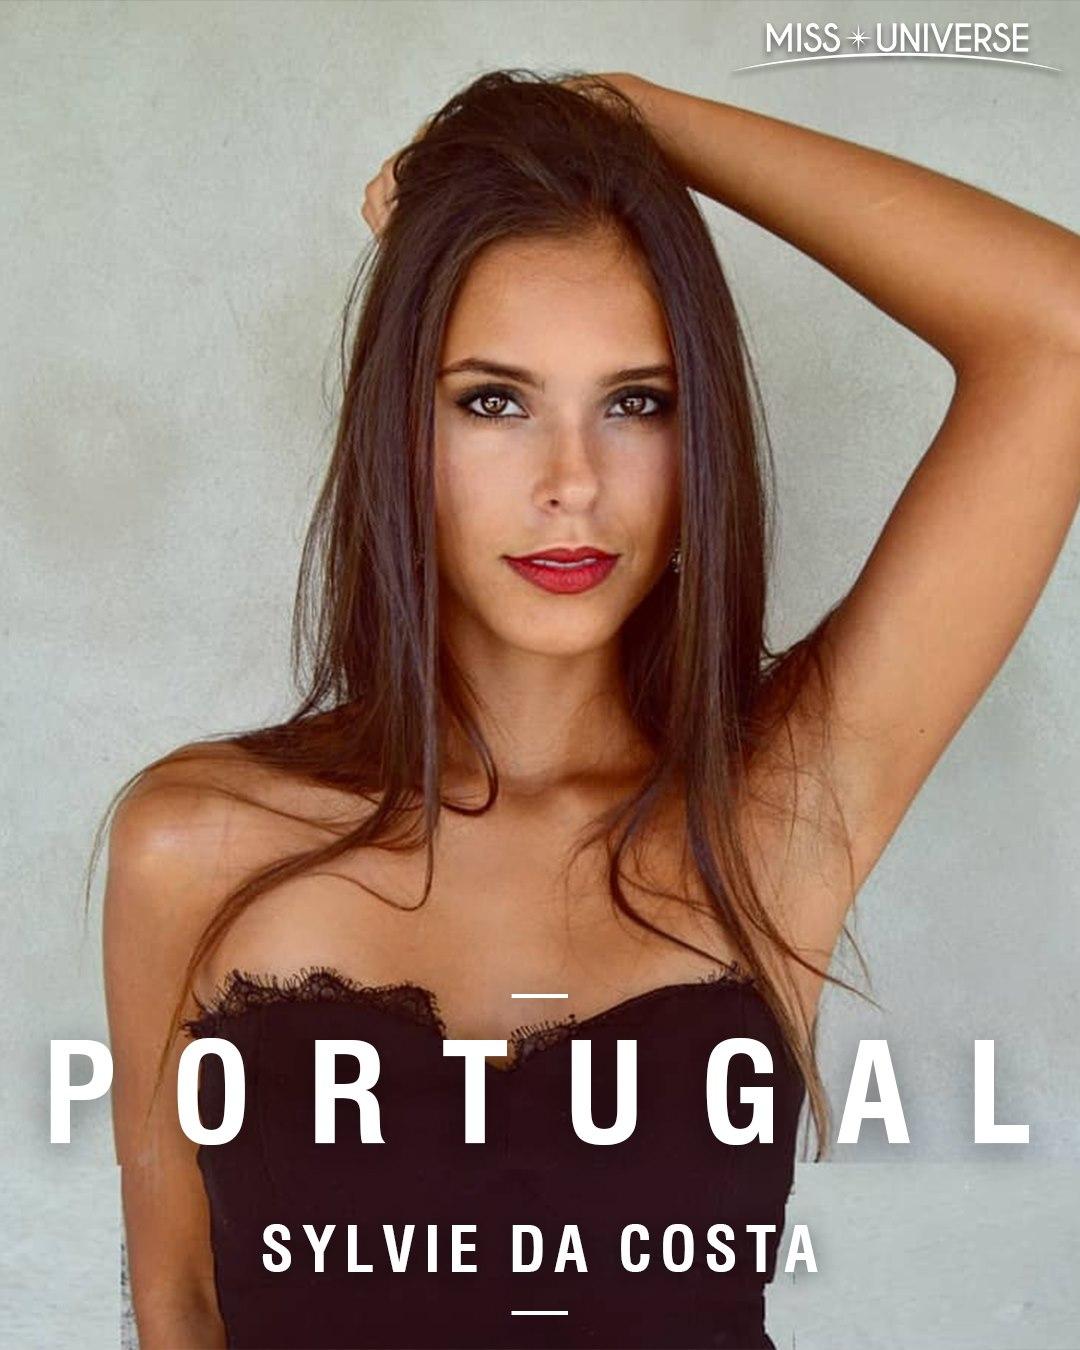 Sylvie Silva (PORTUGAL 2019) 24